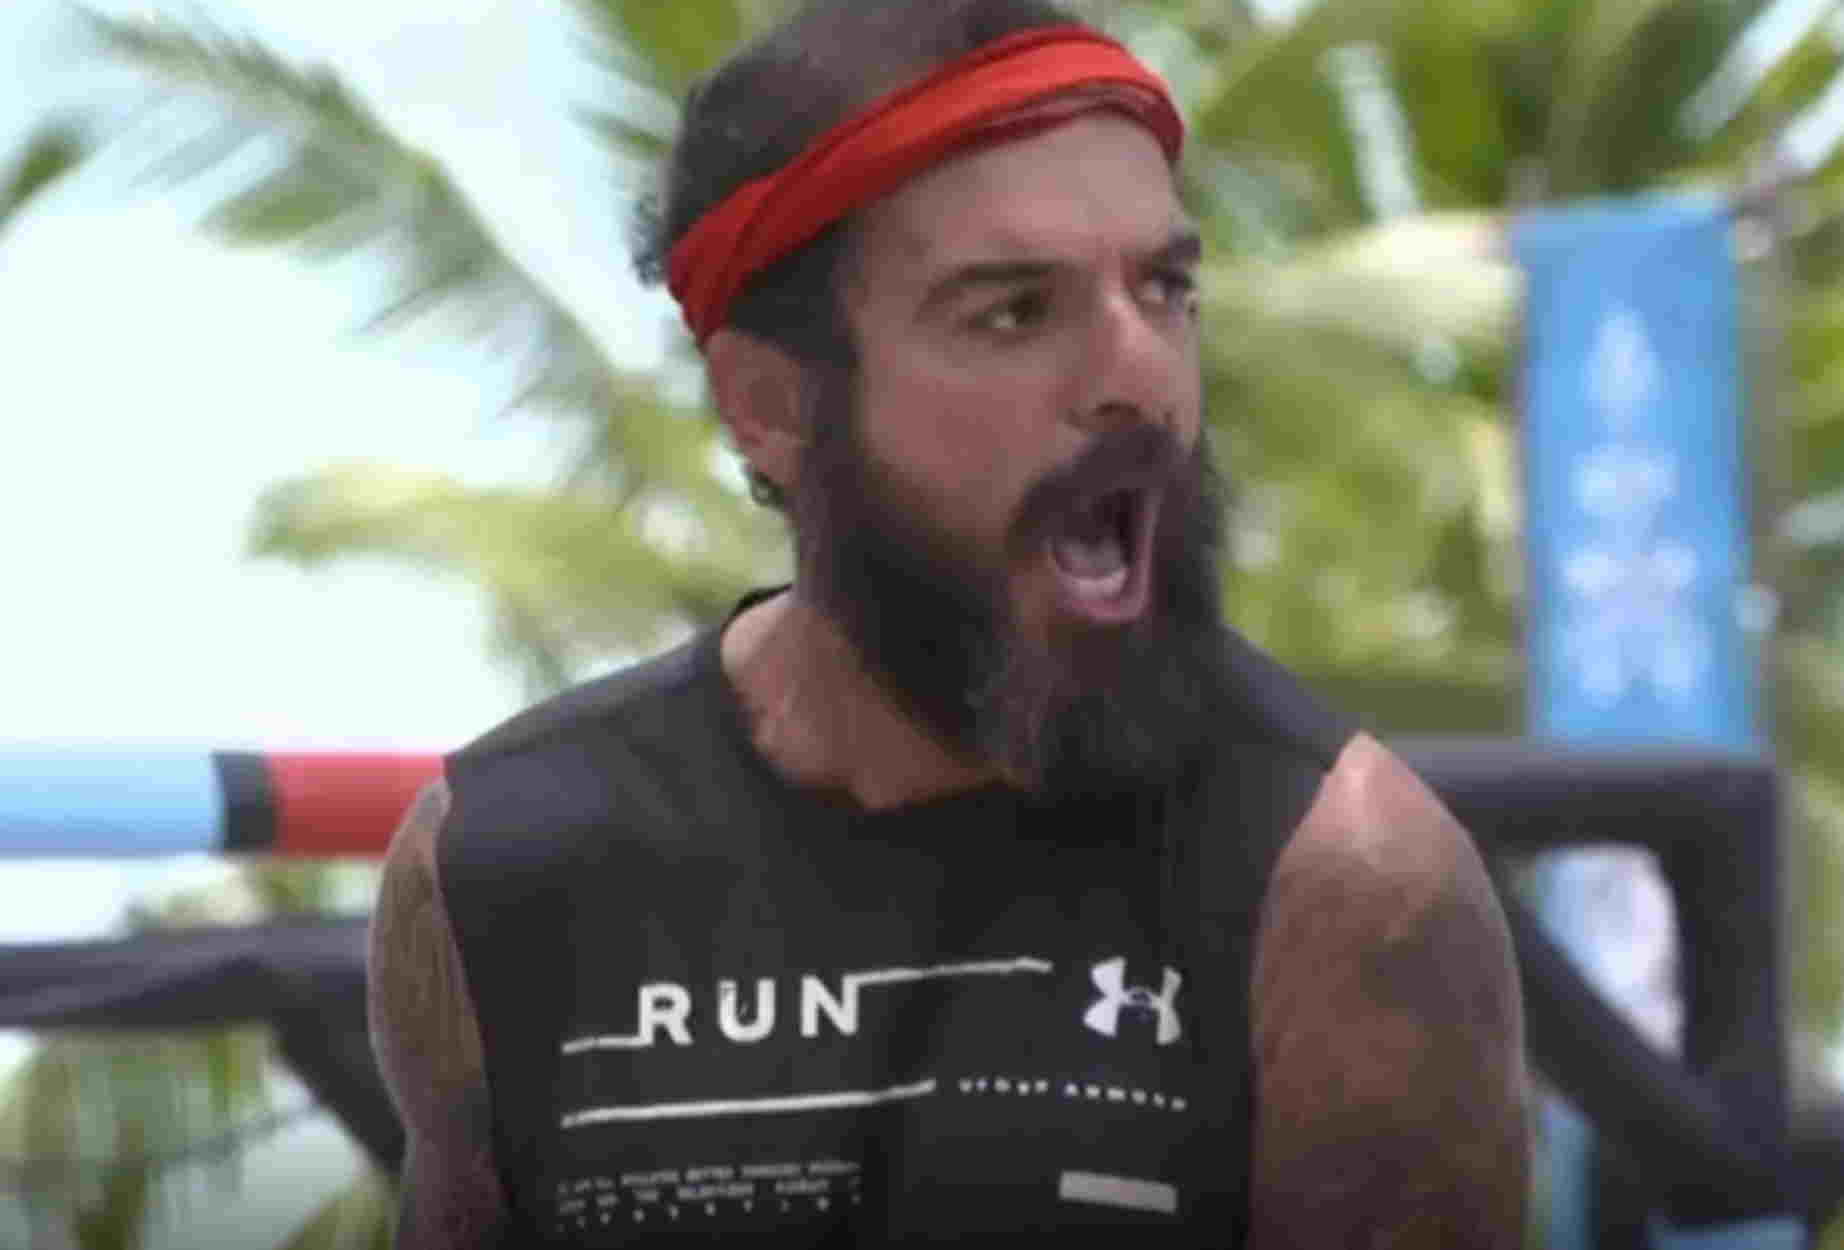 Survivor spoiler: Μάθε πρώτος ποιοι είναι οι δύο νέοι υποψήφιοι προς αποχώρηση απόψε!